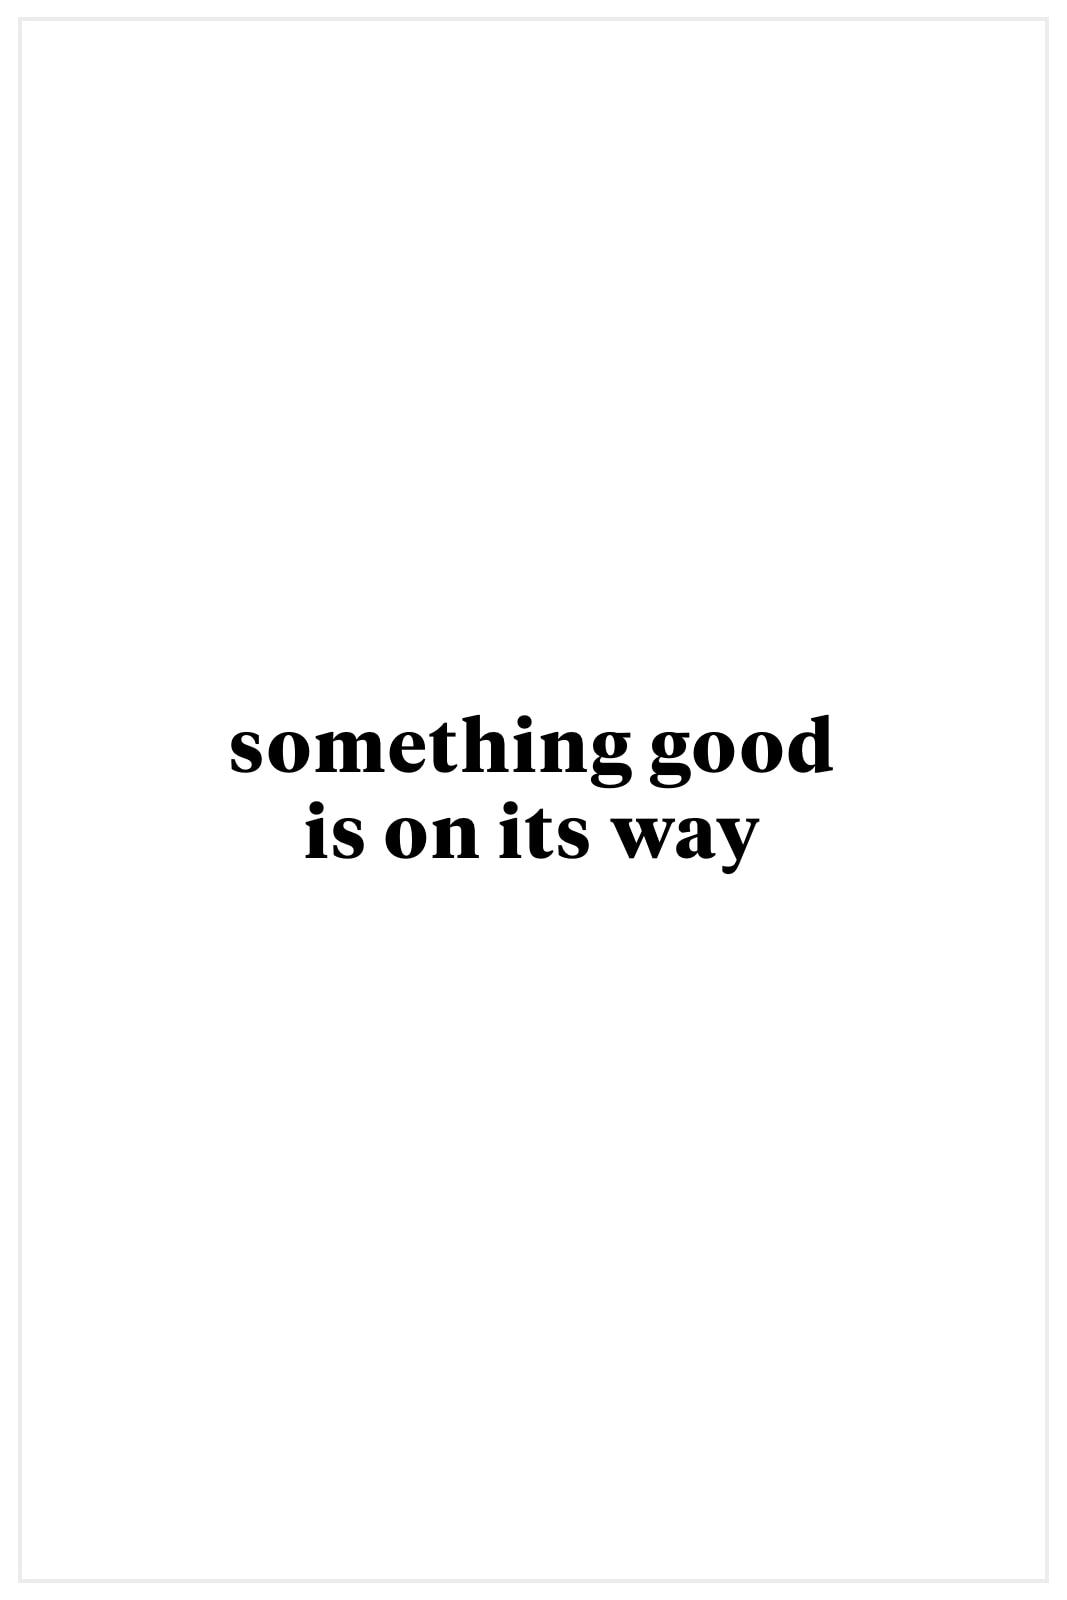 MaryJo Bold Ring Set